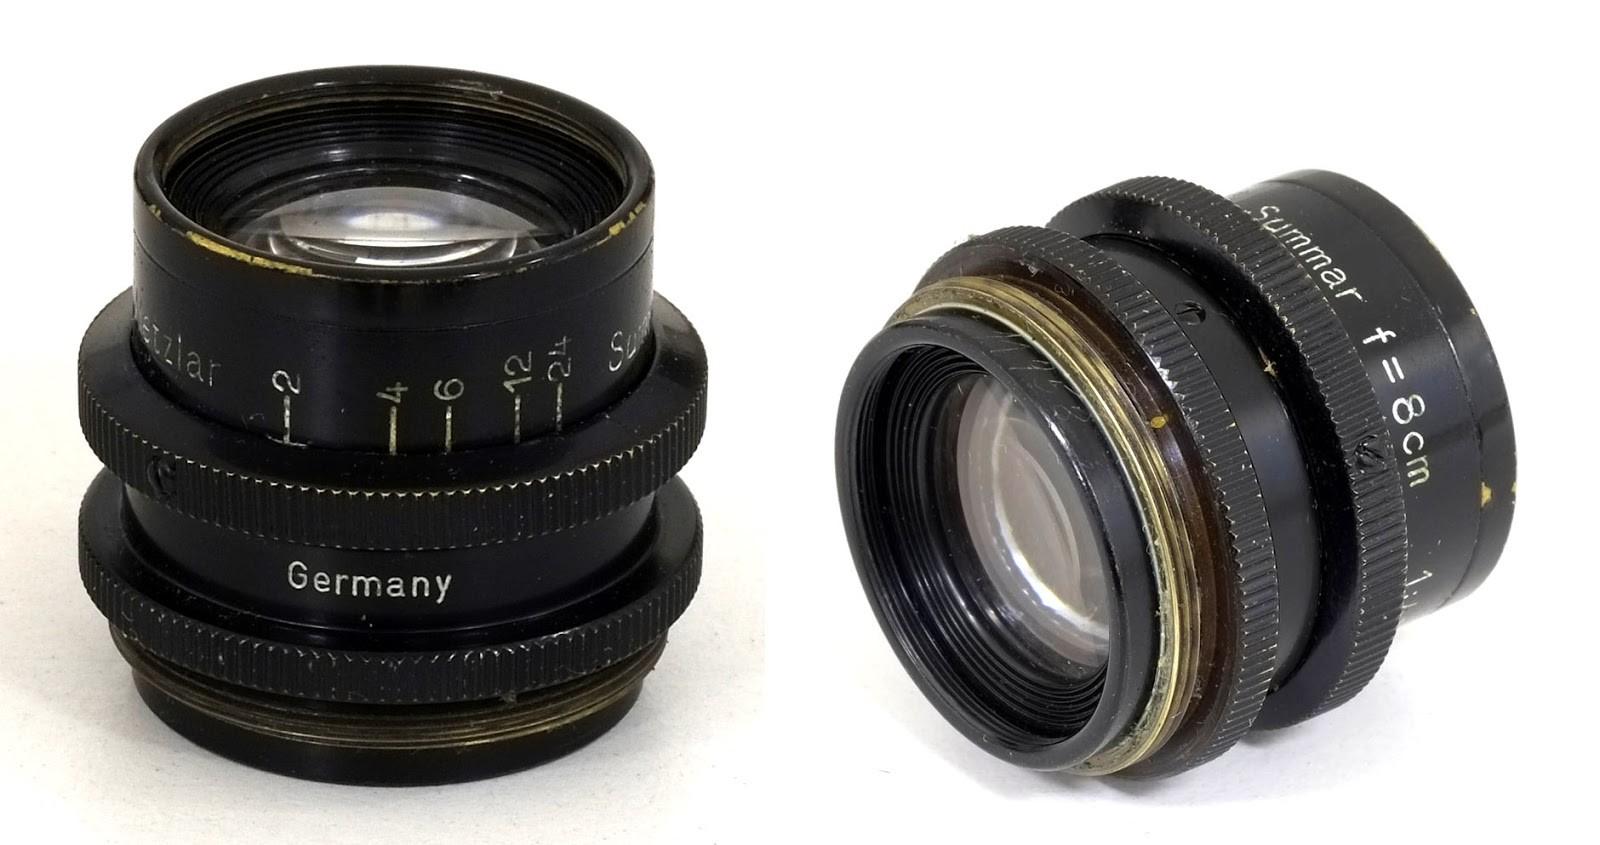 Ernst Leitz Summar(Mikro-Summar) 8cm F4.5